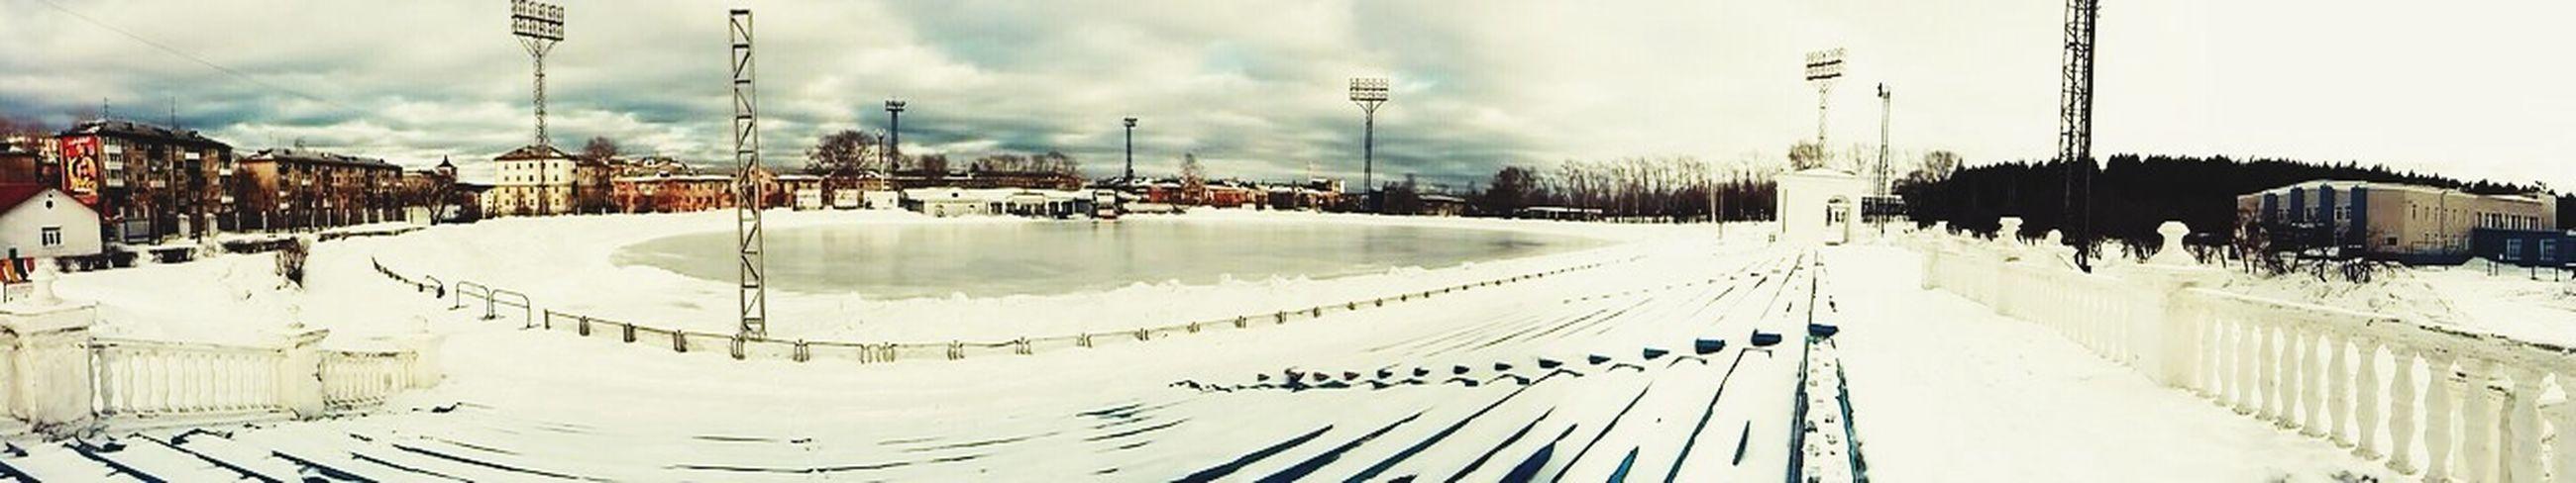 Winter stadium